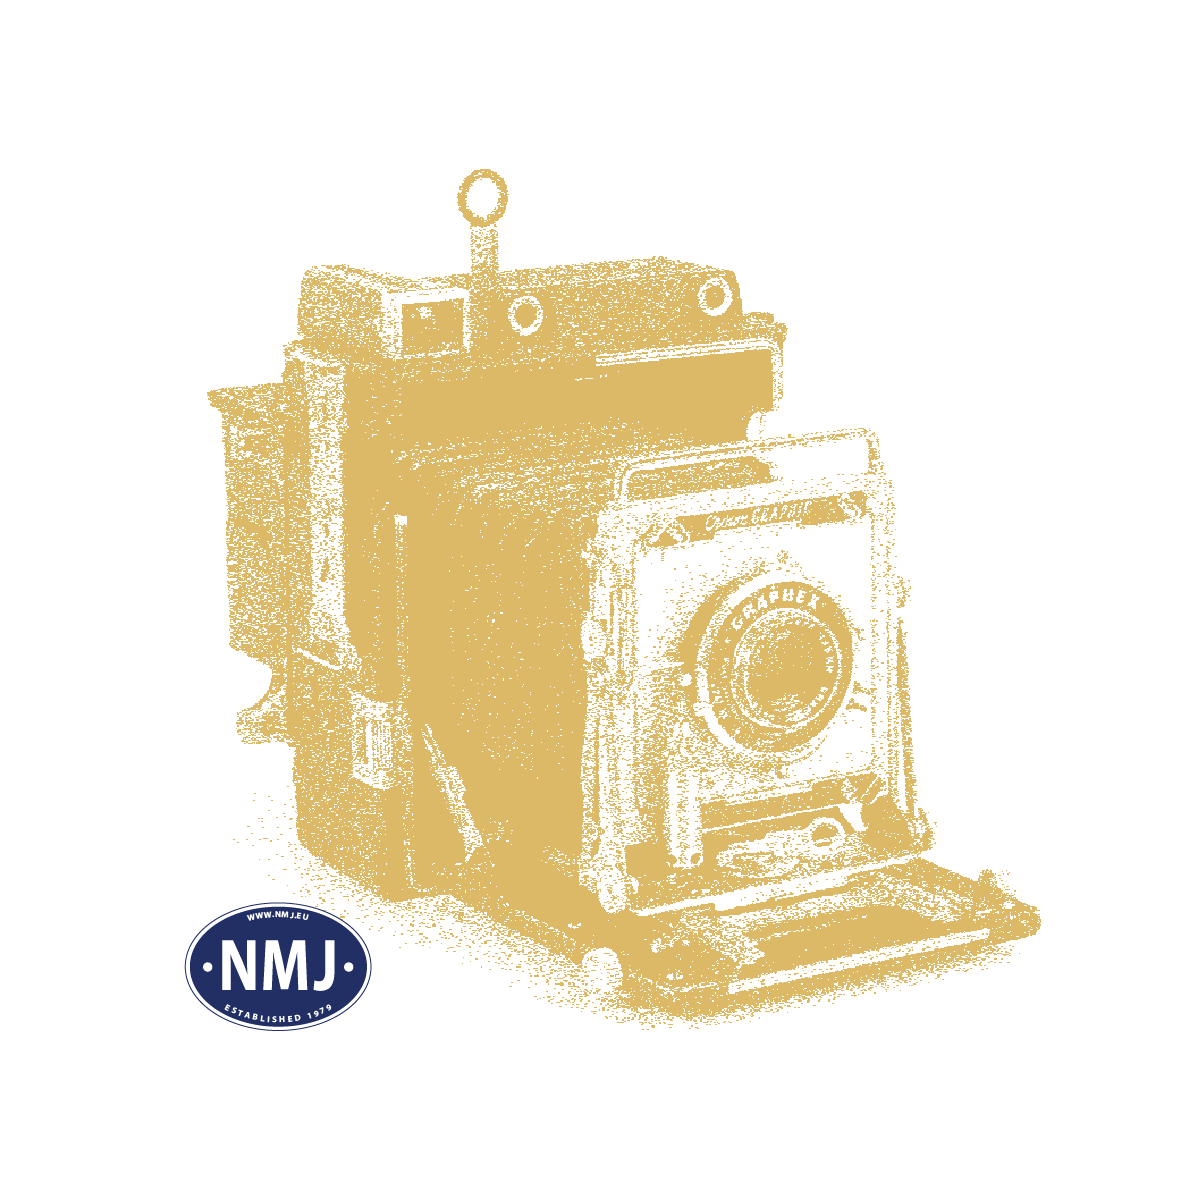 NMJT90018 - NMJ Topline NSB Di3 604, Gammeldesign, DCC m/ Lyd